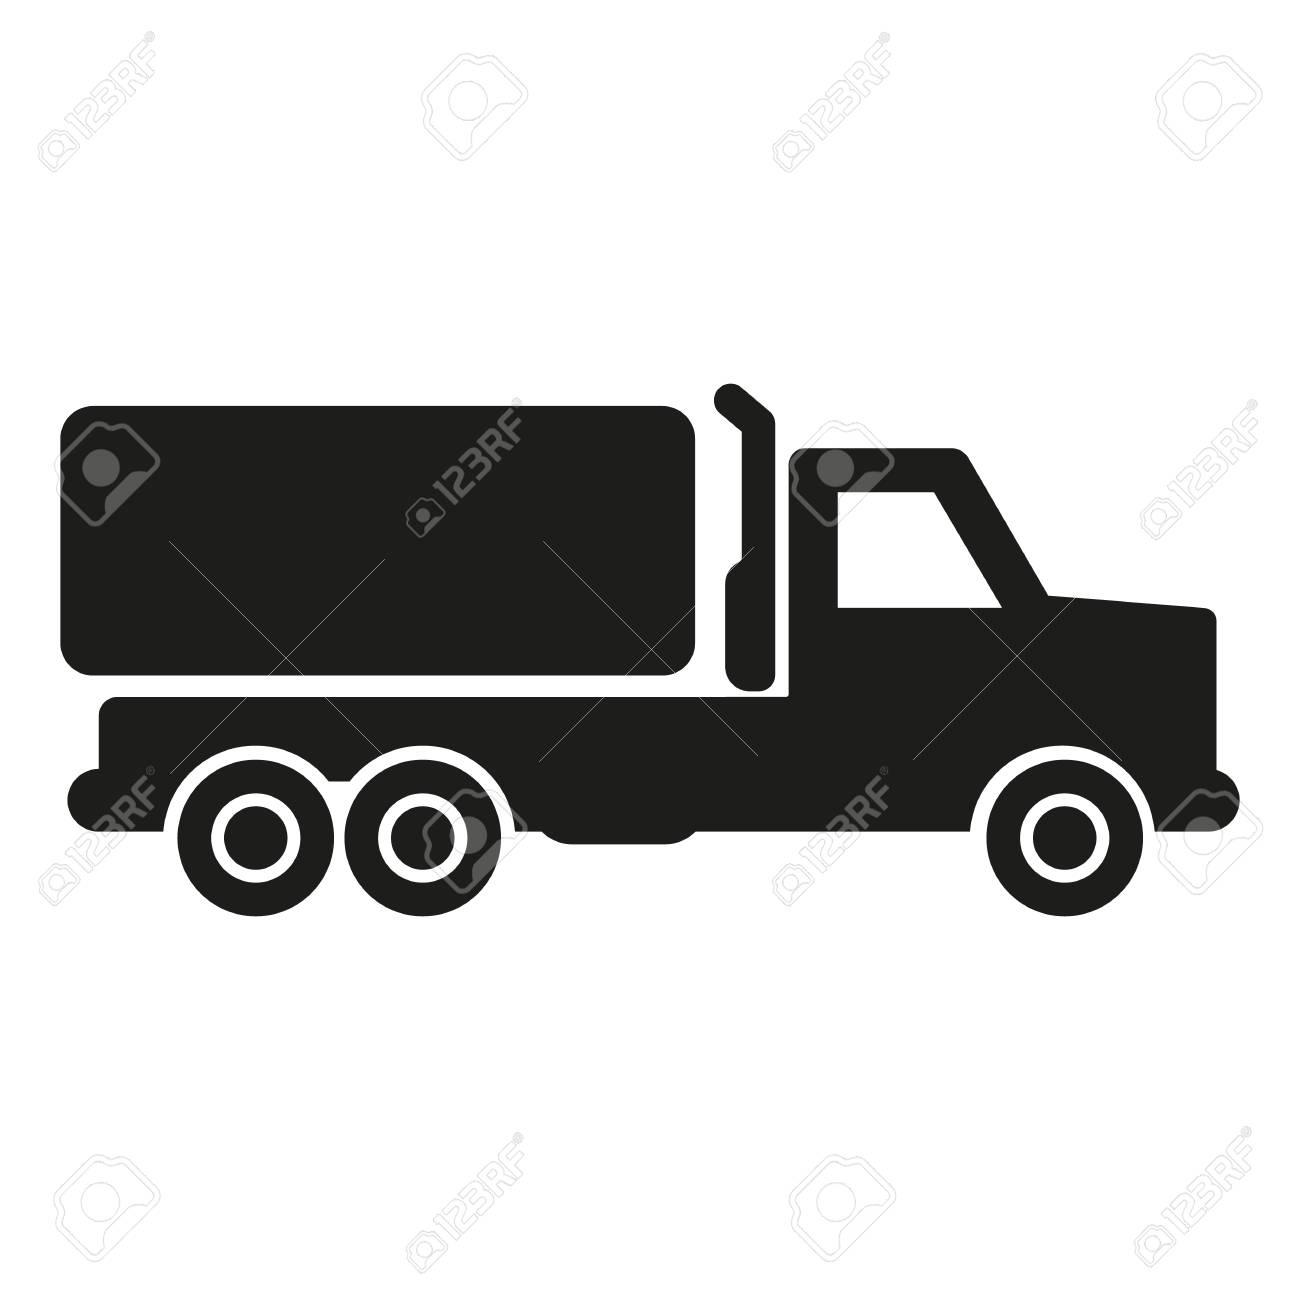 Camión Con Silueta De Icono Simple De Carga Sobre Fondo Blanco ...